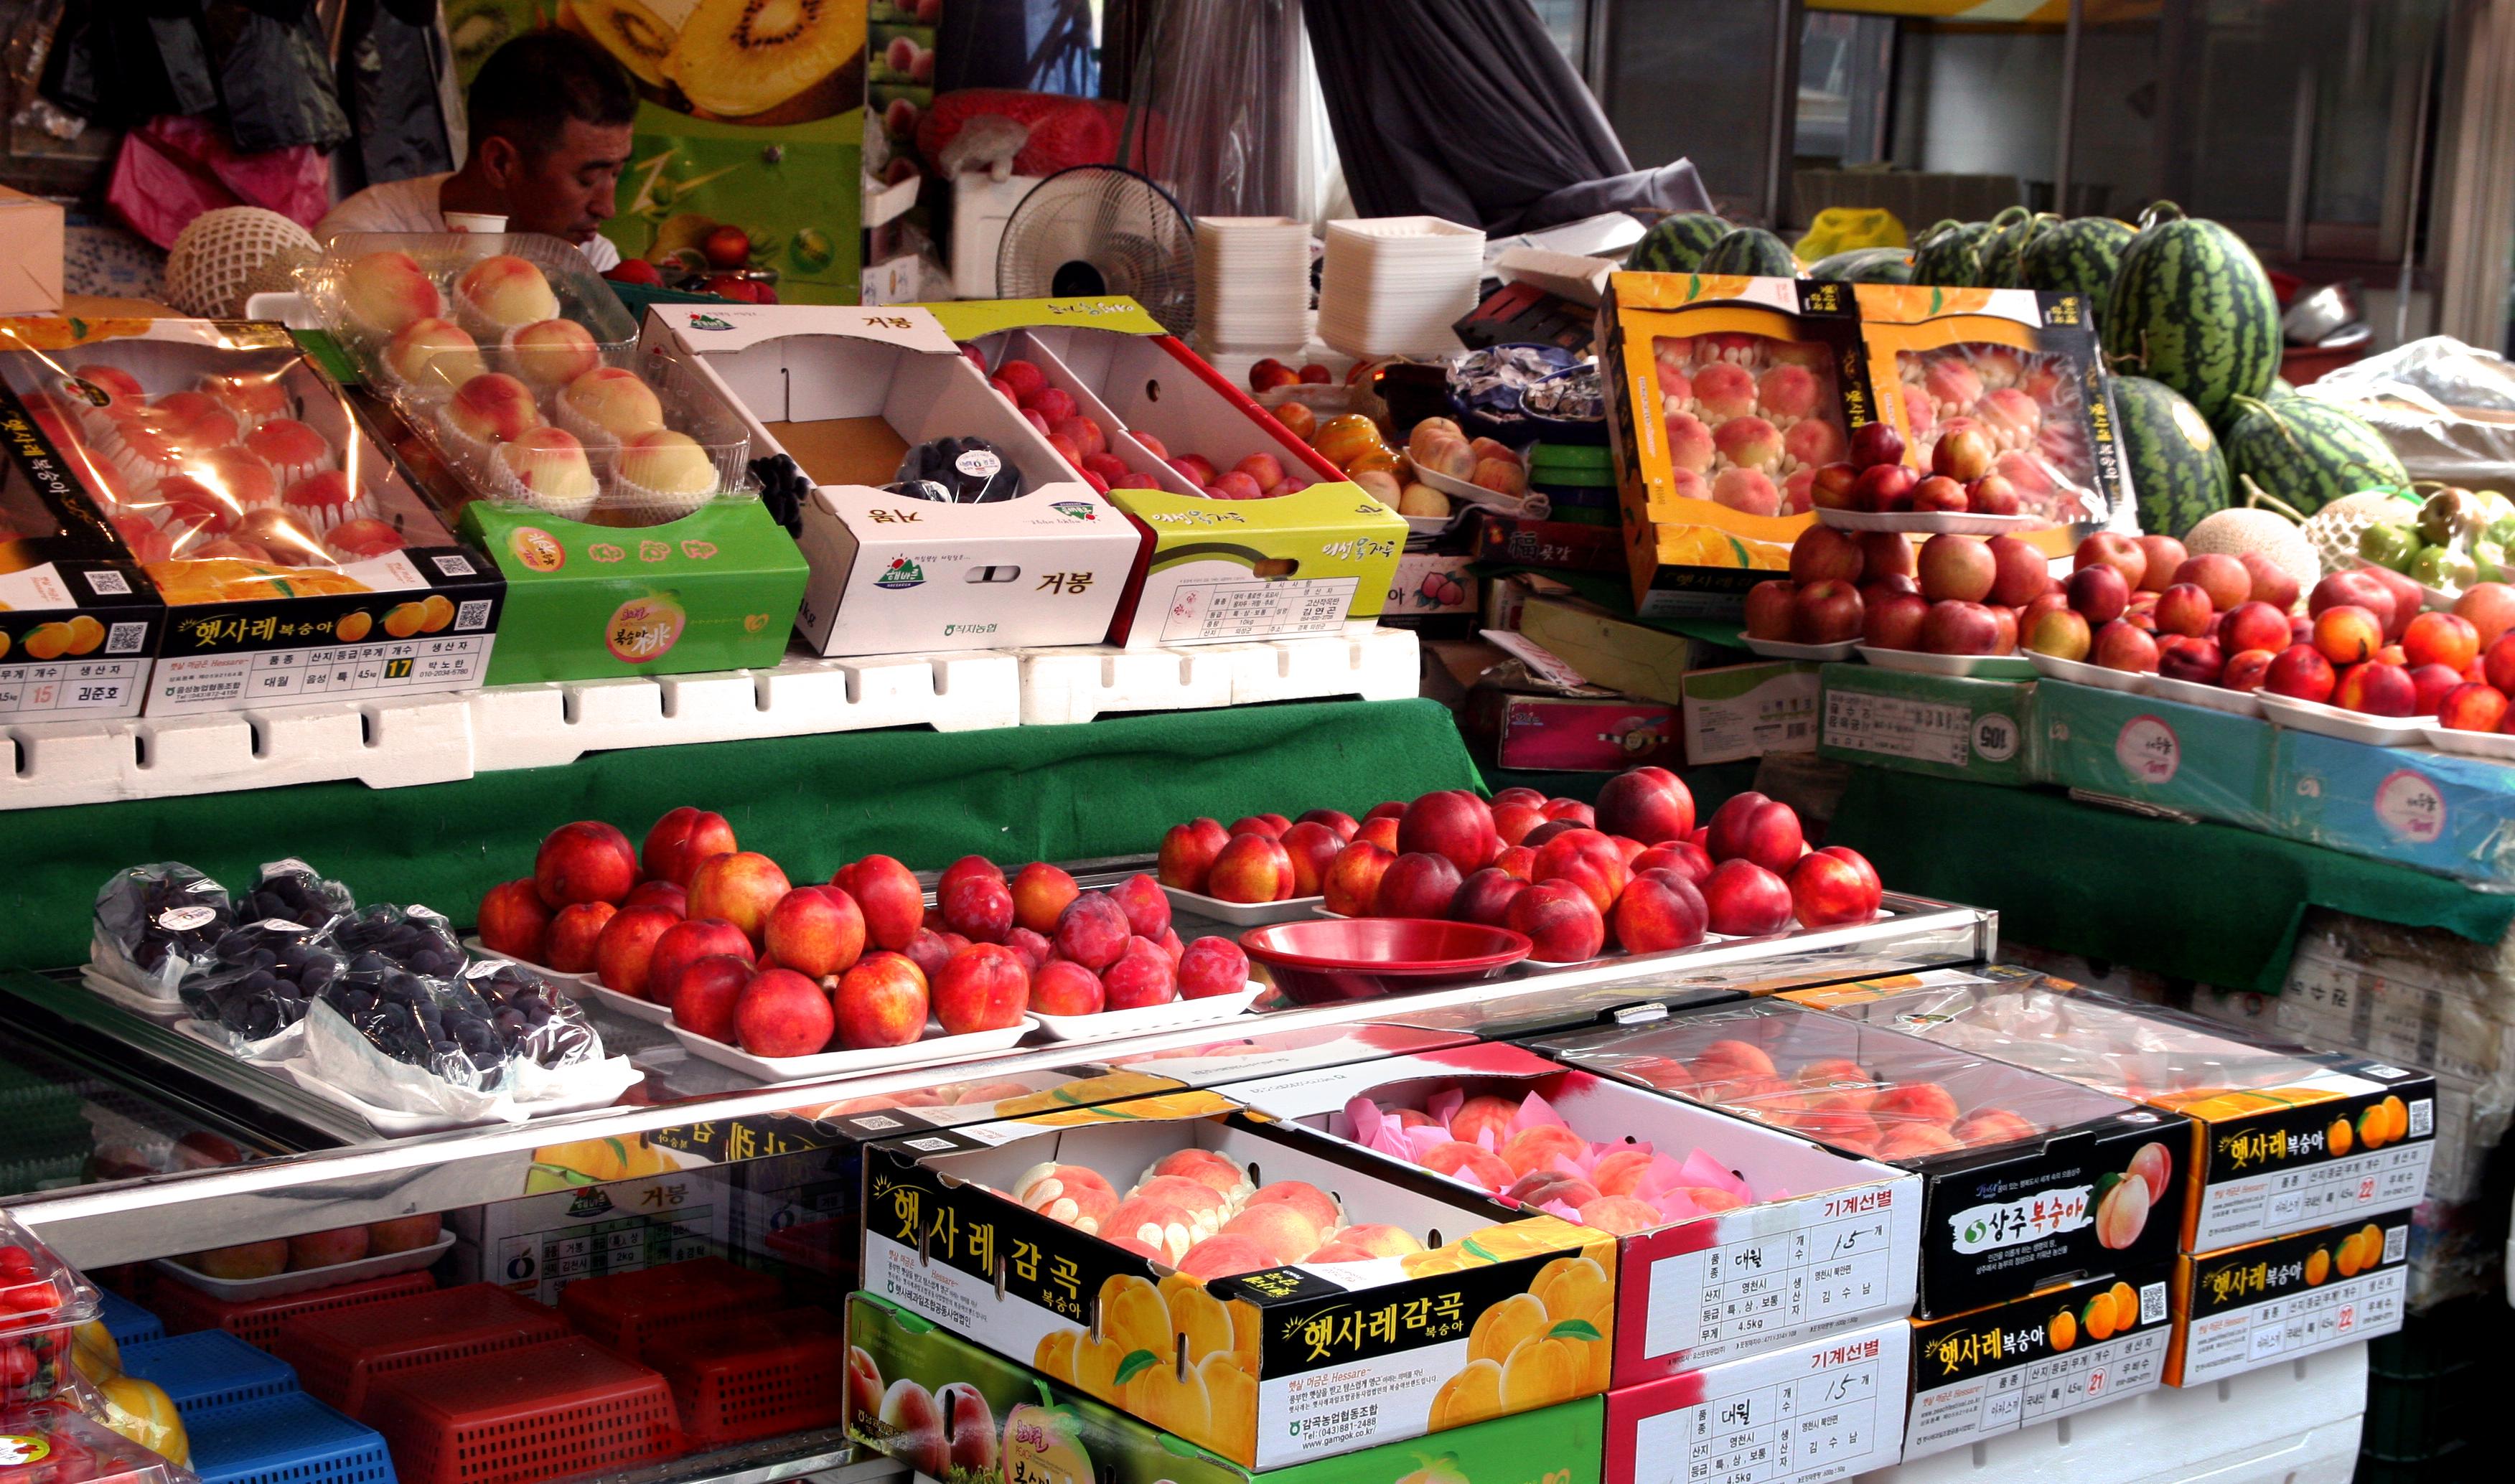 Local Korean market